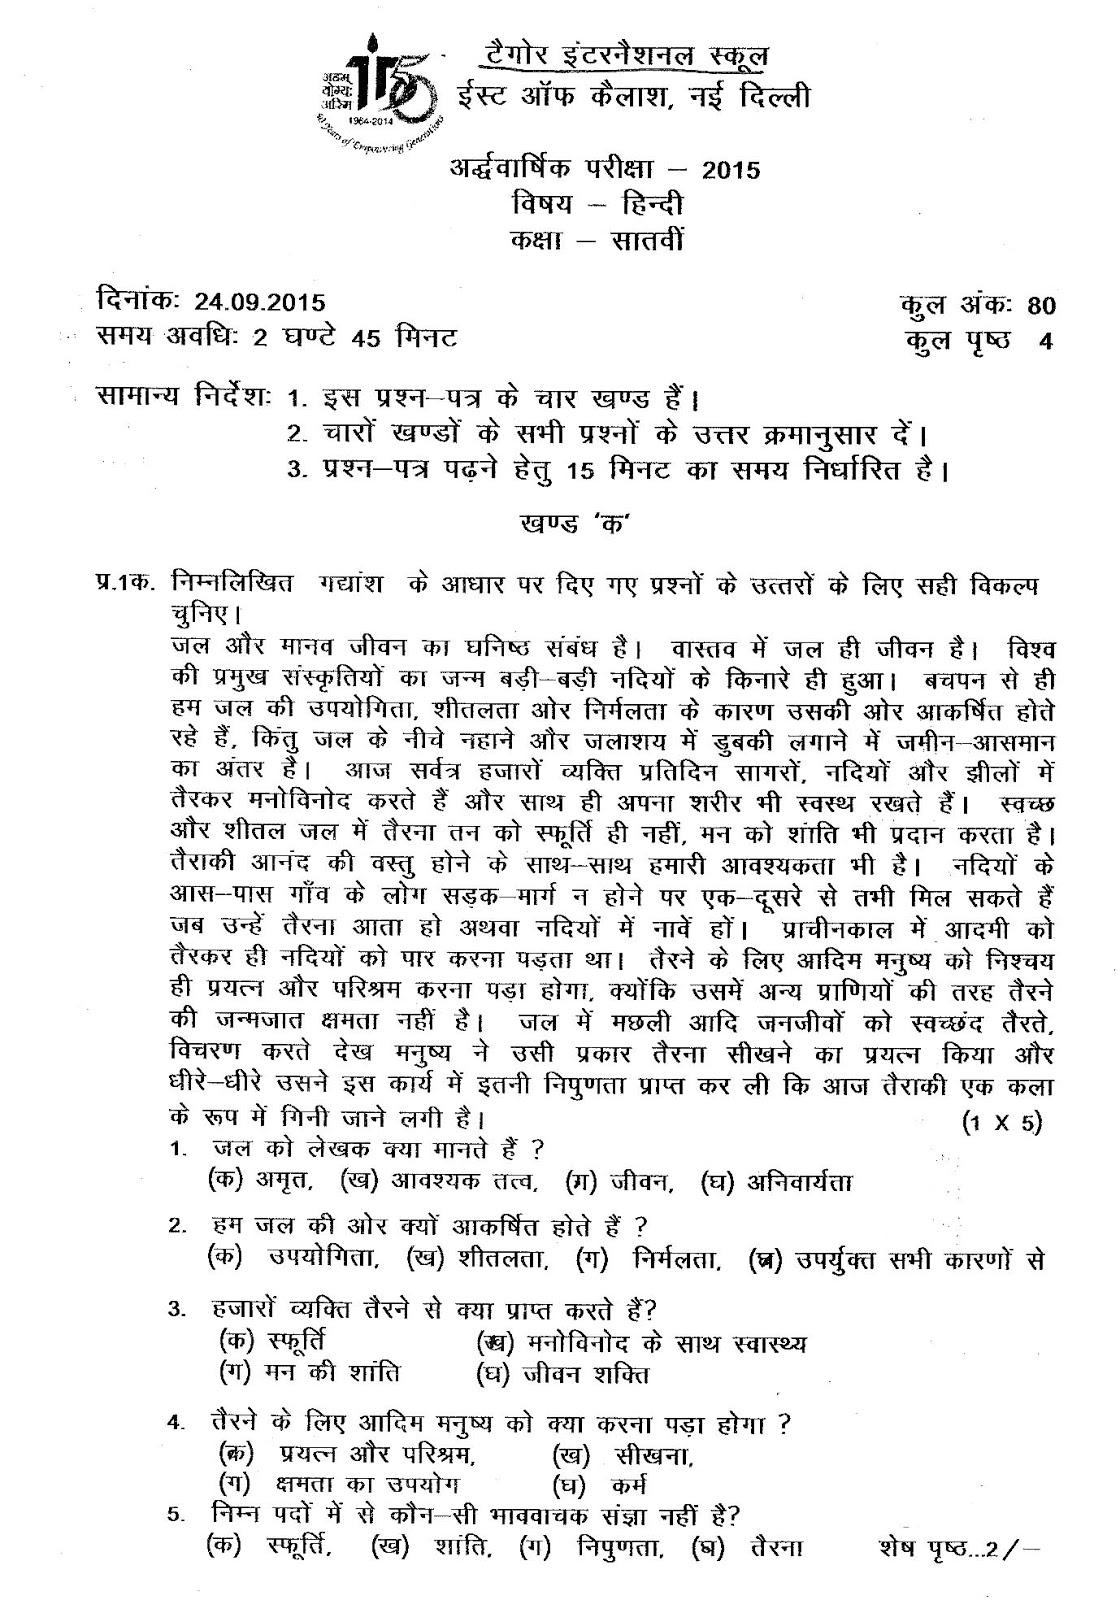 HINDI4all: Class VII Hindi TAGORE INTERNATIONAL SCHOOL (EAST OF ...